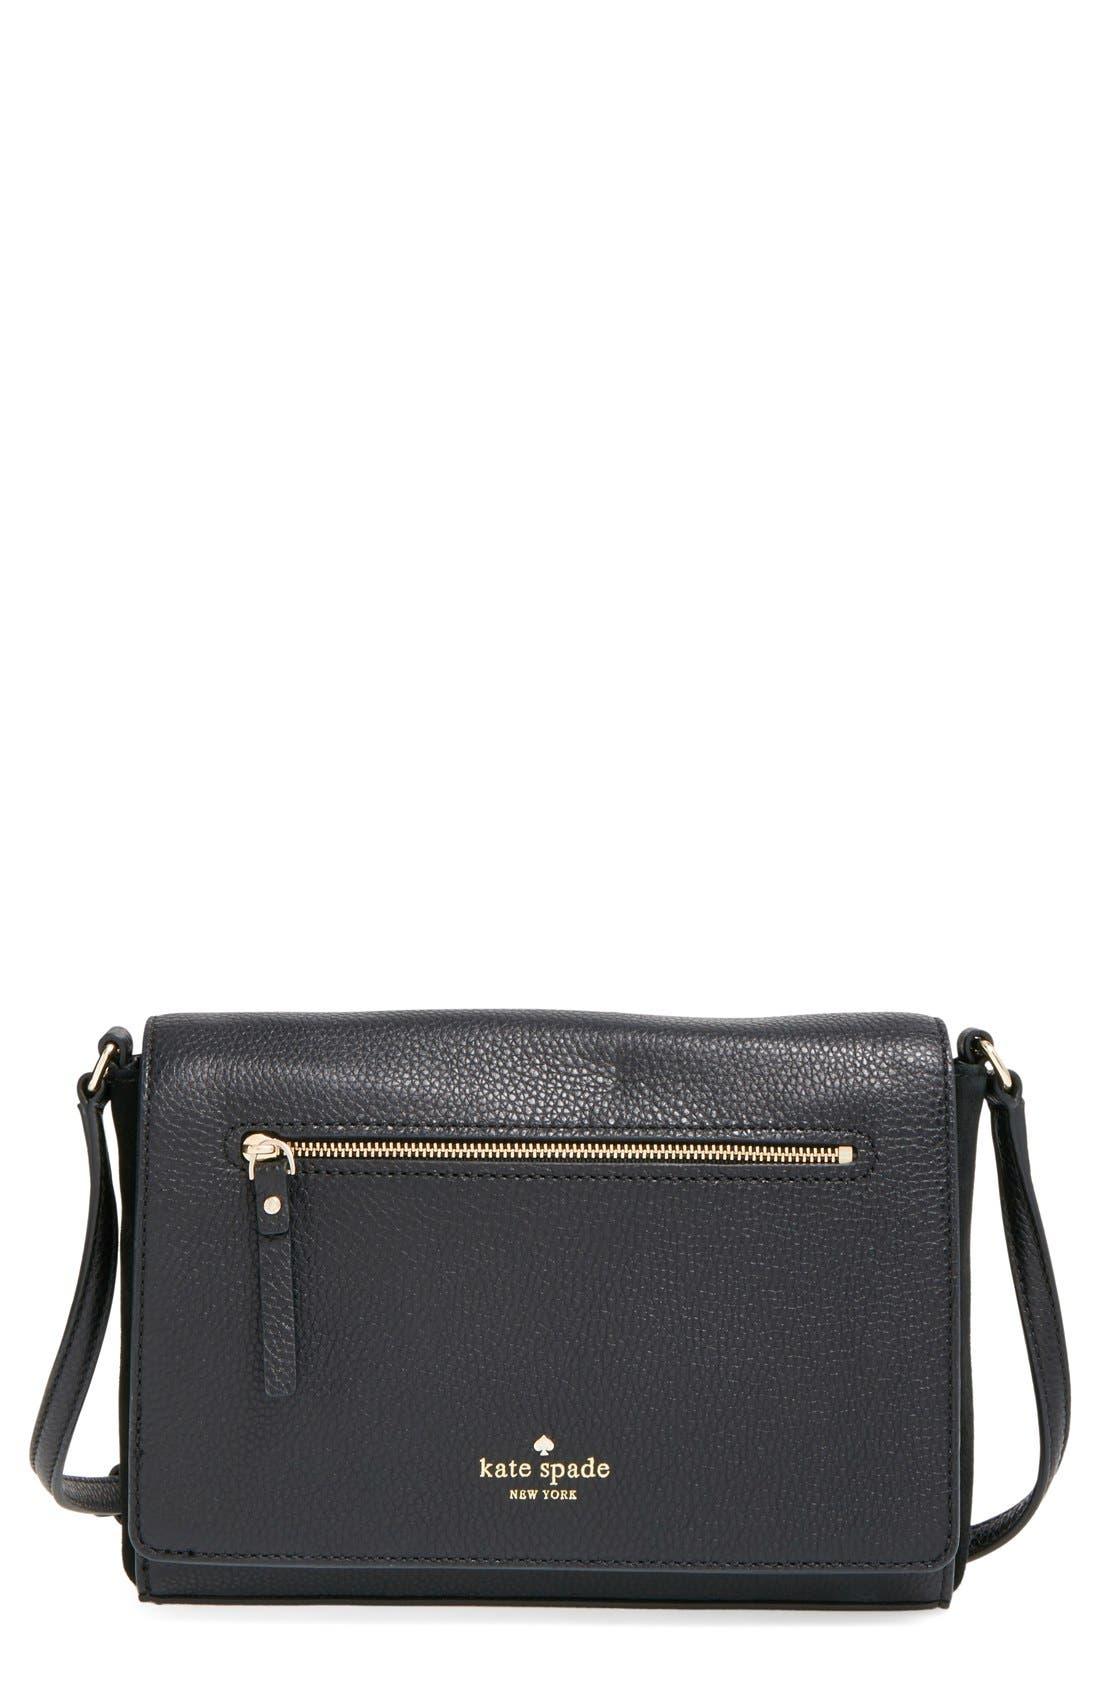 Alternate Image 1 Selected - kate spade new york 'matthews drive - patty' leather & suede crossbody bag